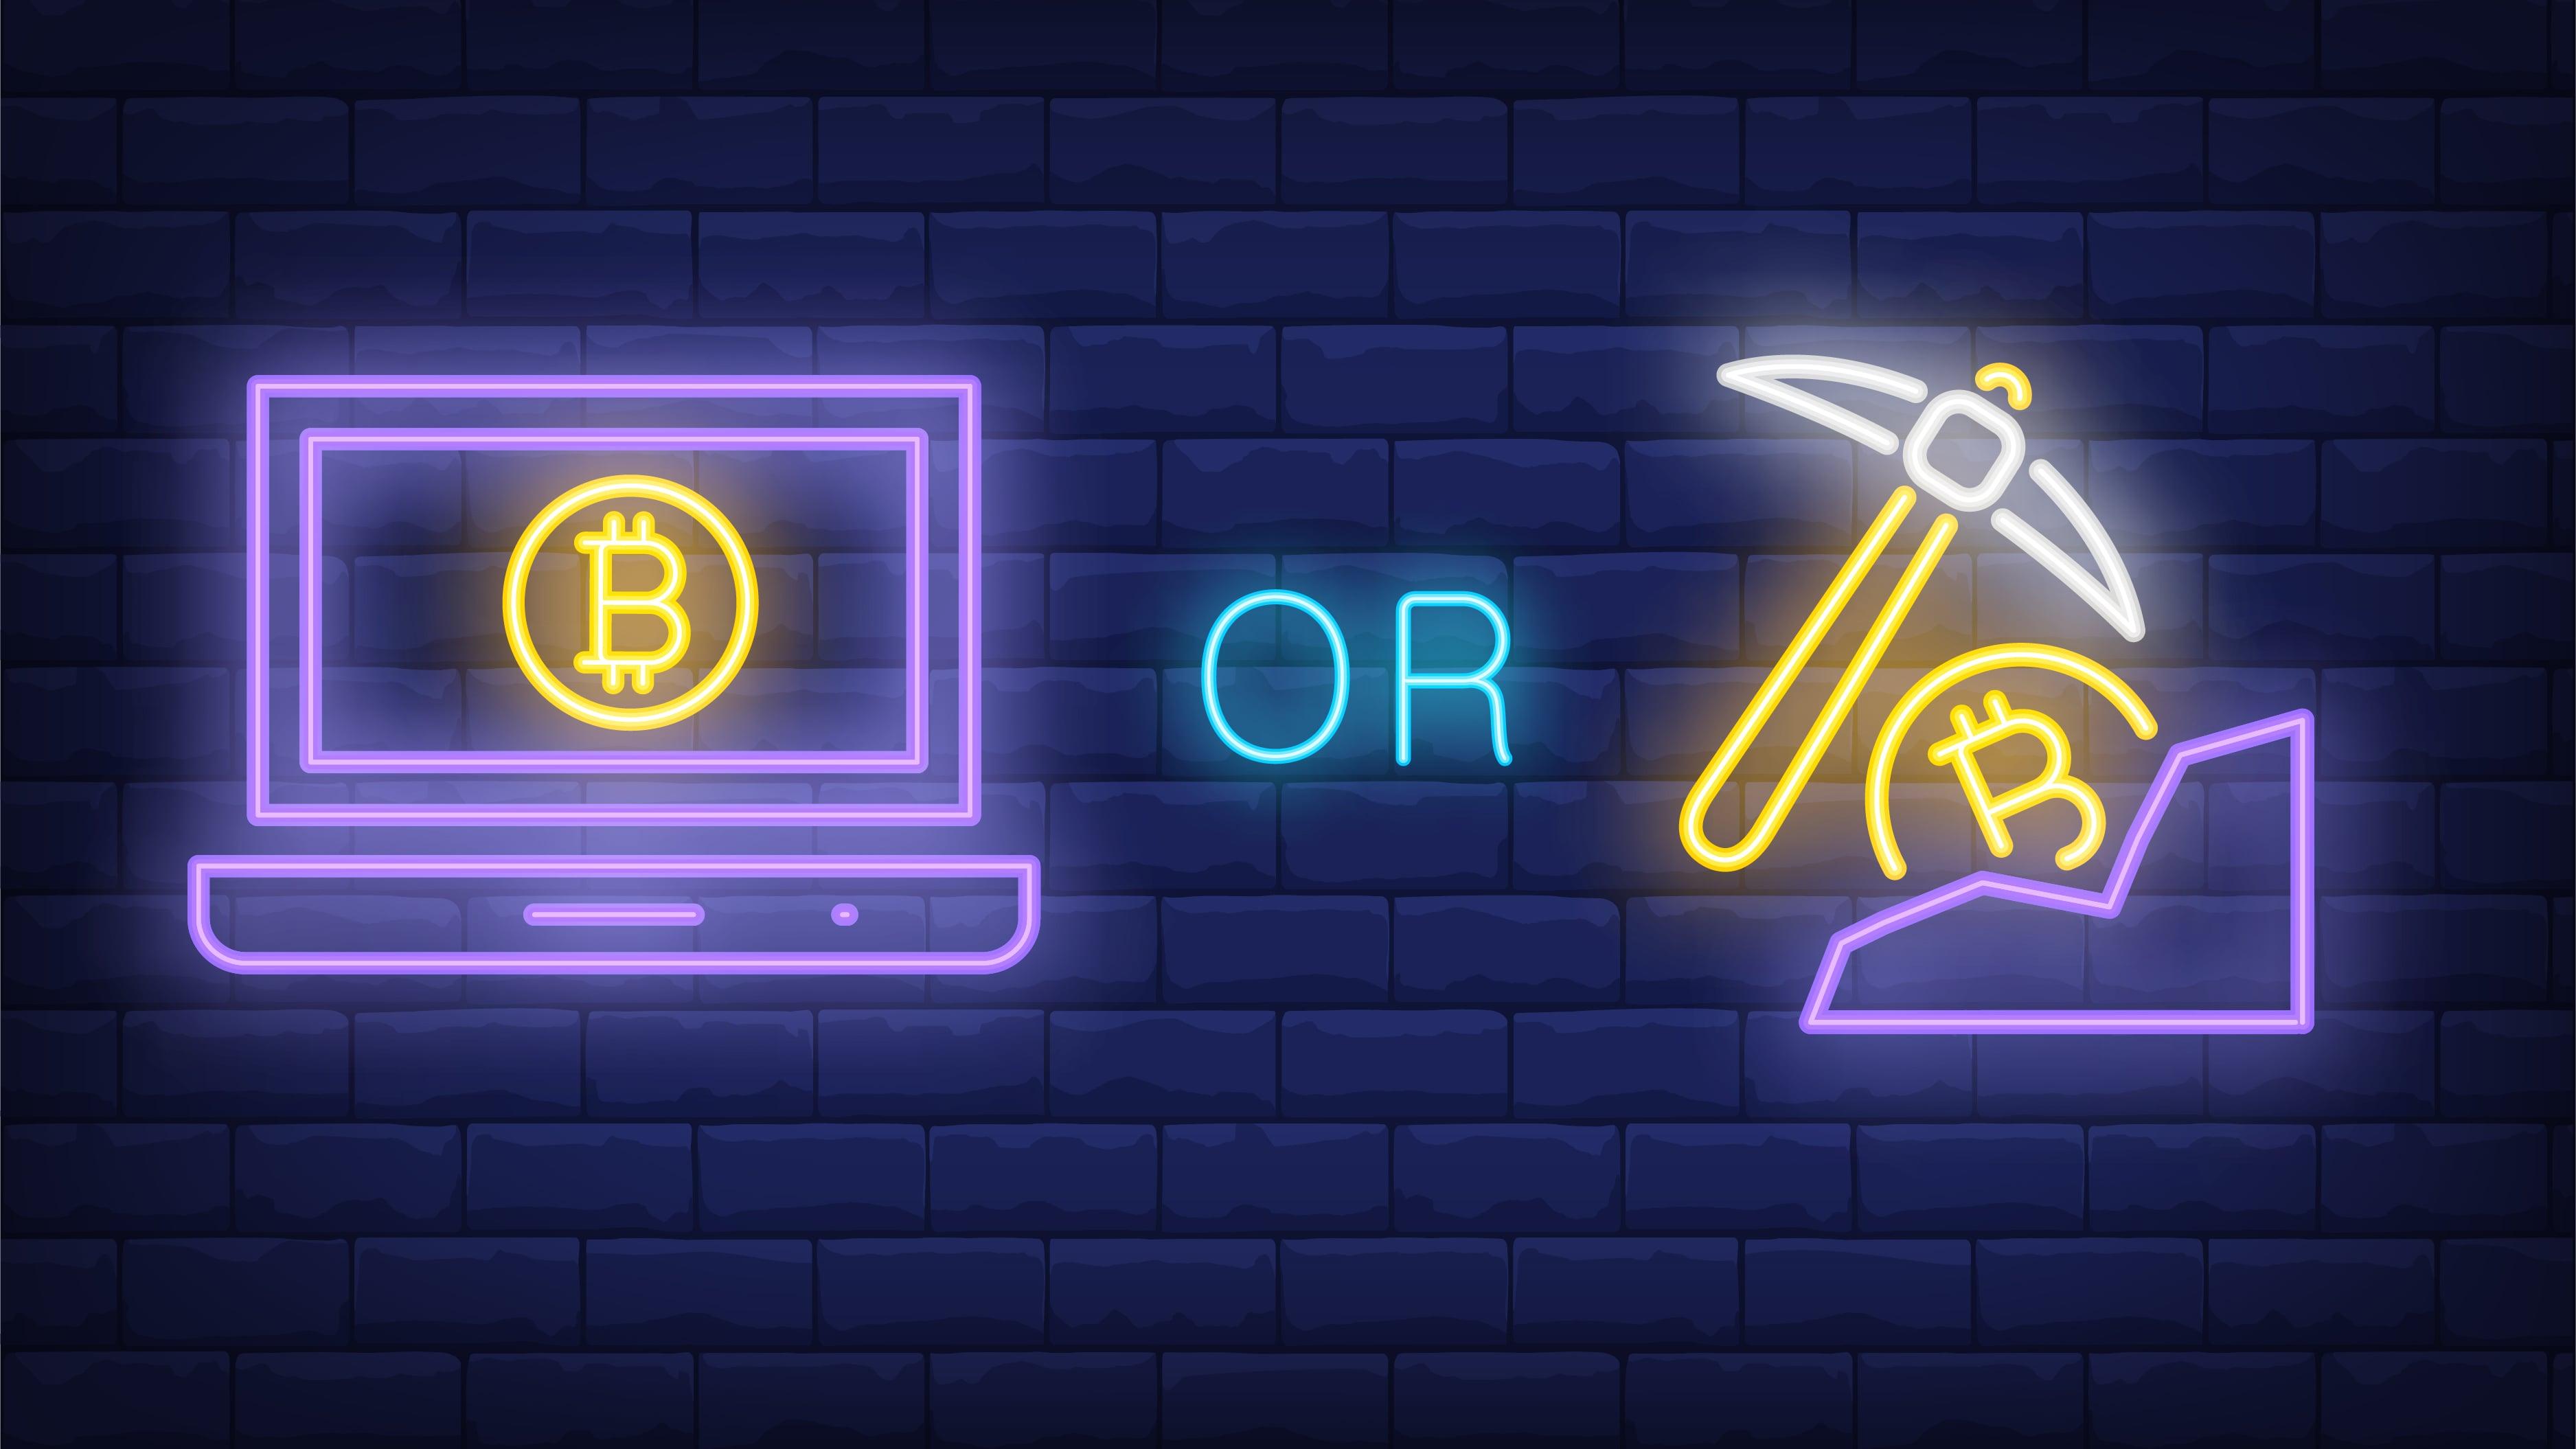 Классификация криптовалют в зависимости от алгоритма консенсуса